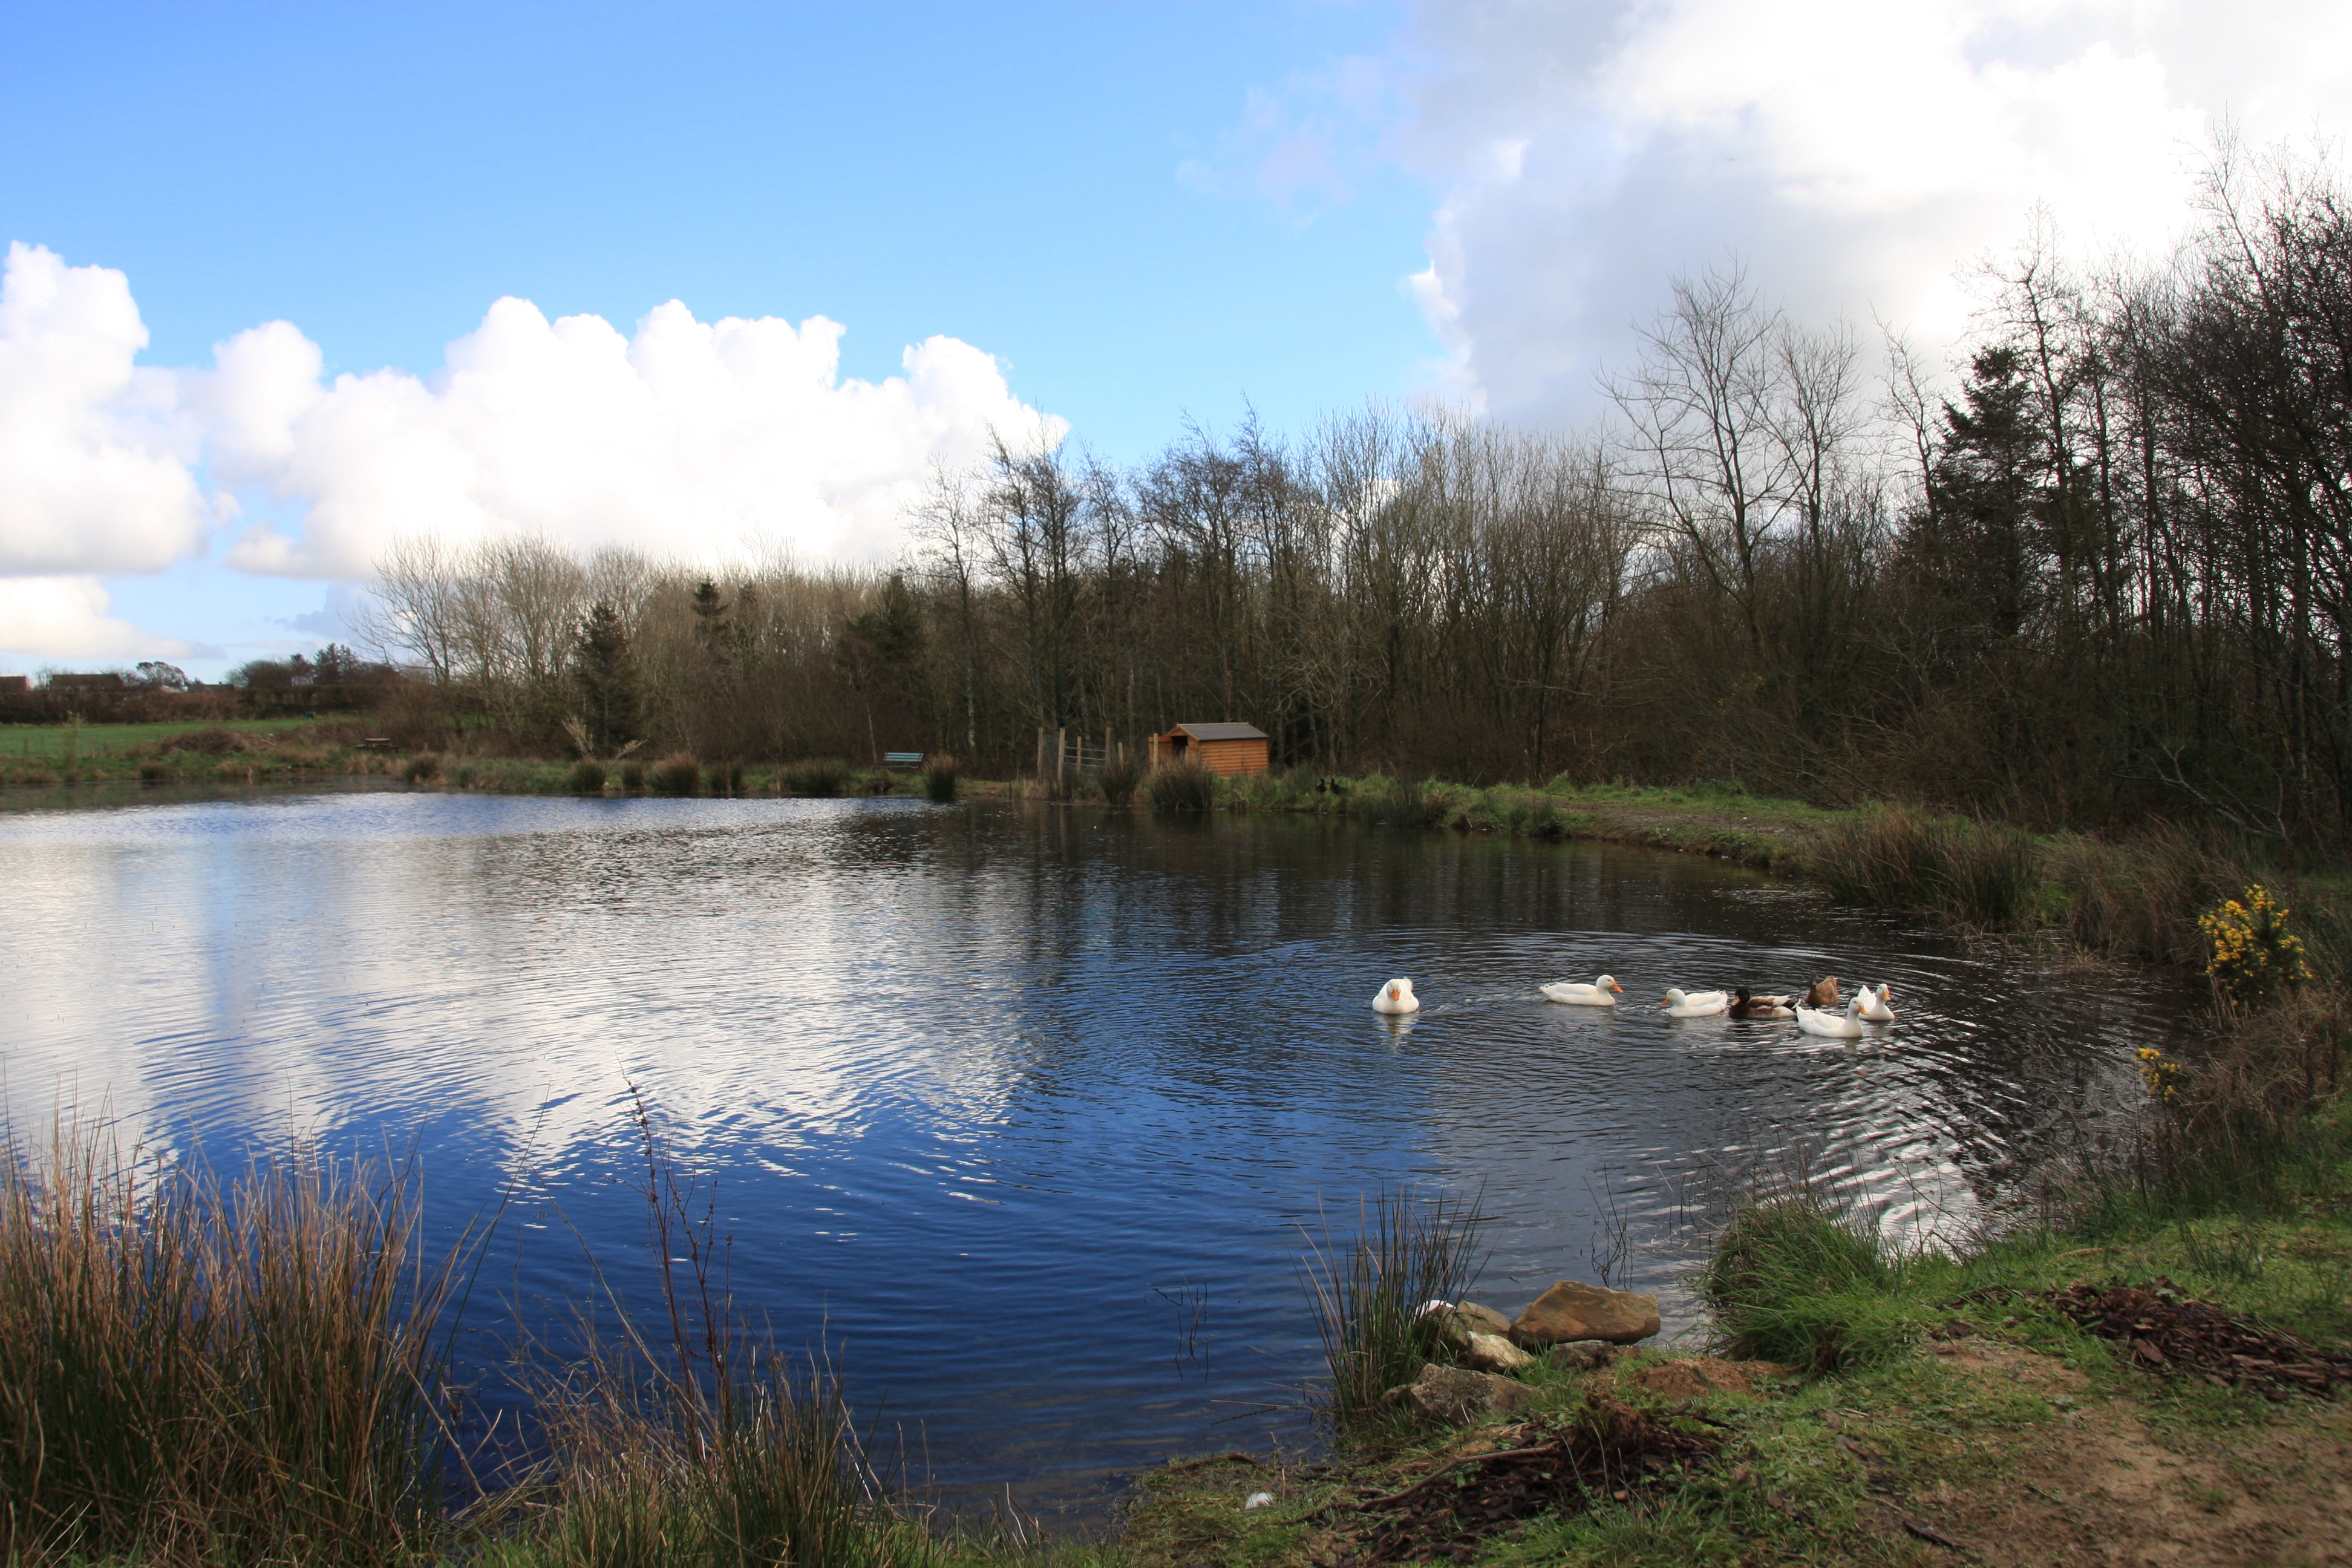 Carp lake, Bwlford Pembrokeshire